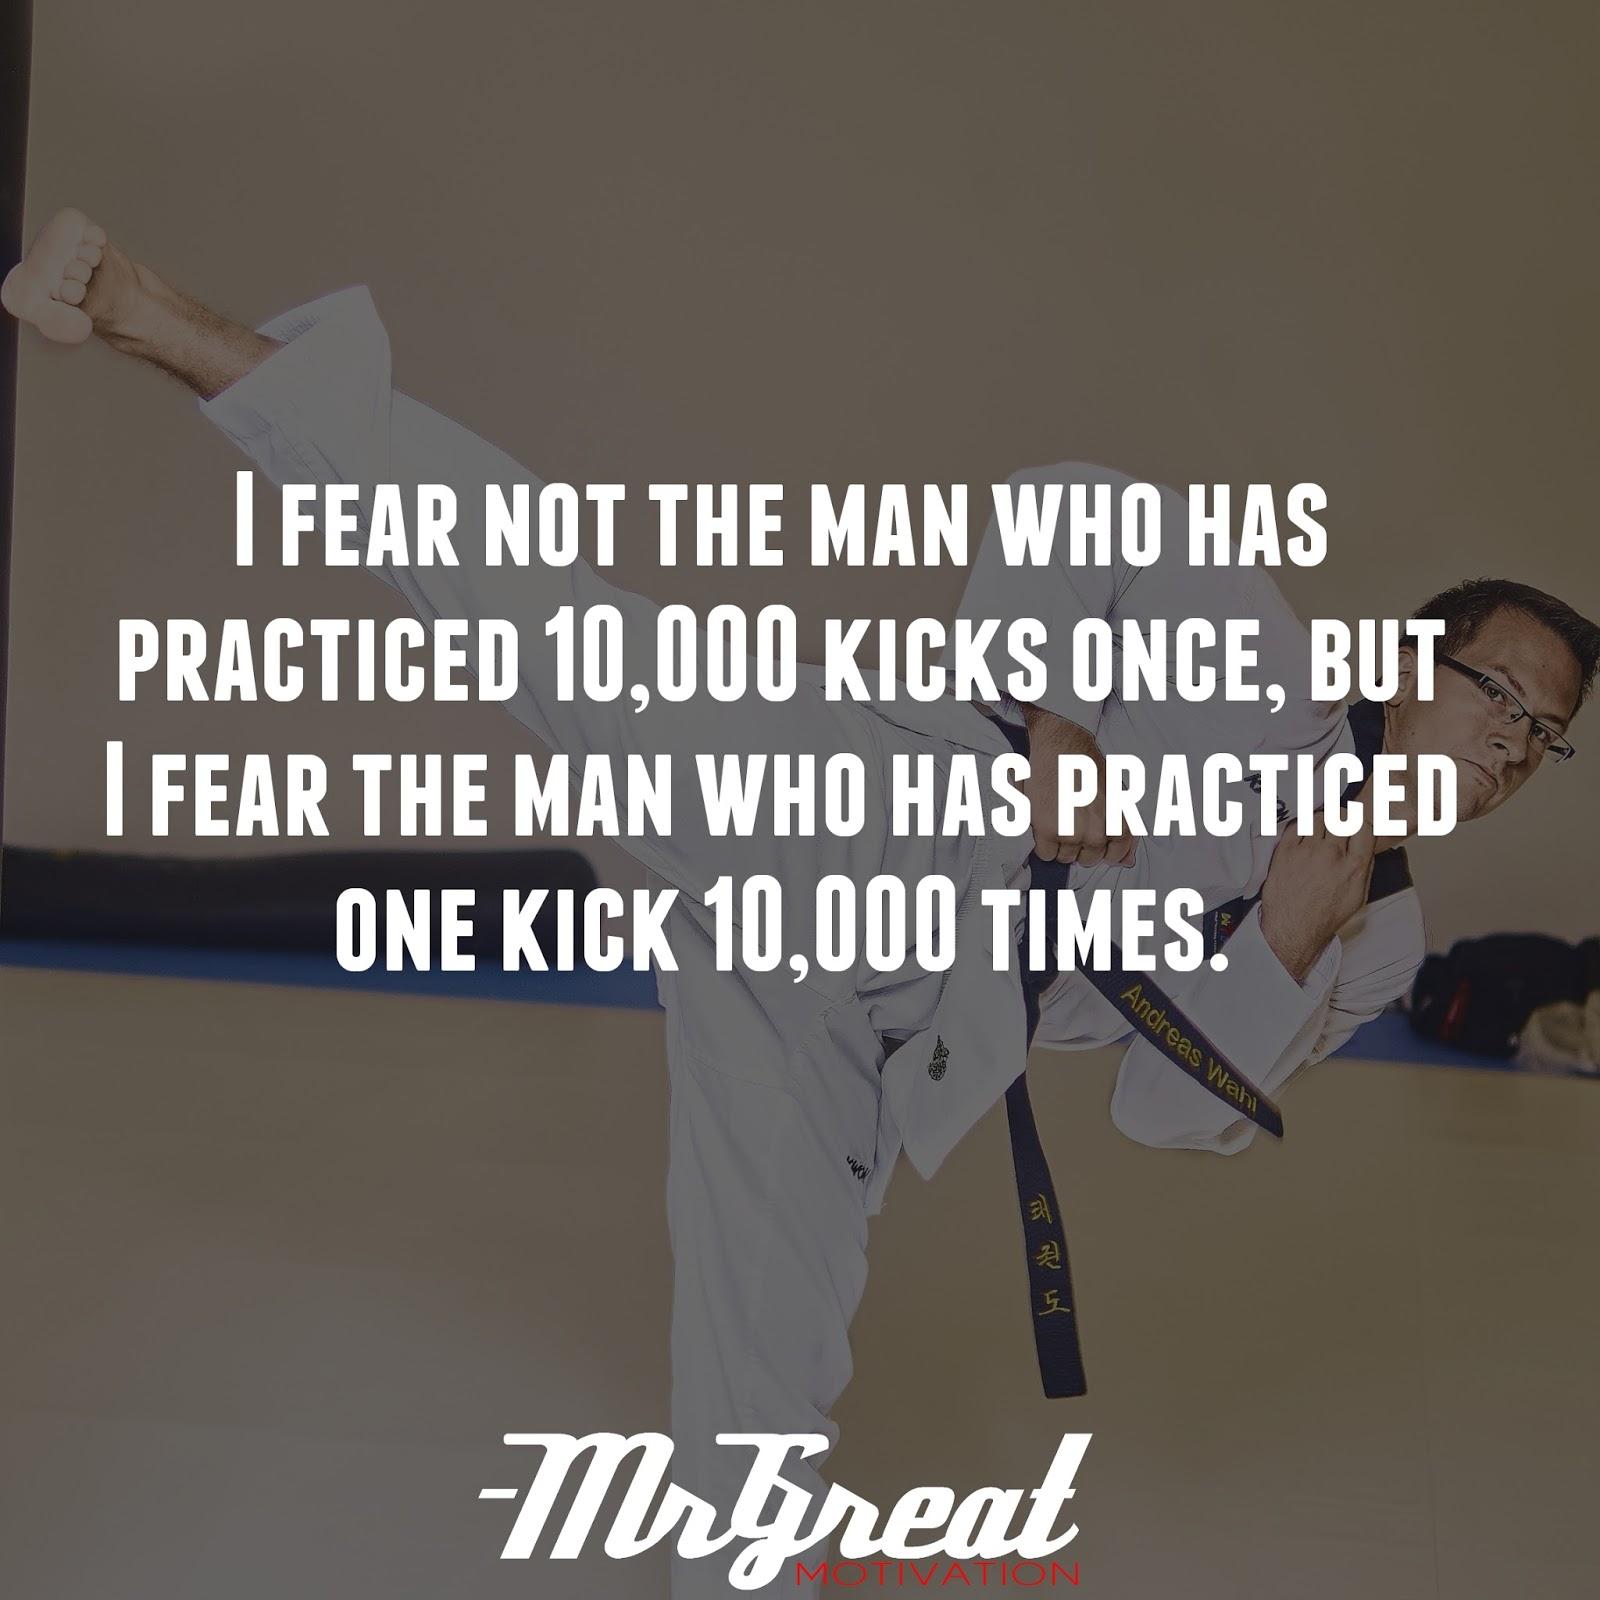 I fear not the man who has practiced 10,000 kicks once, but I fear the man who has practices one kick 10,000 times